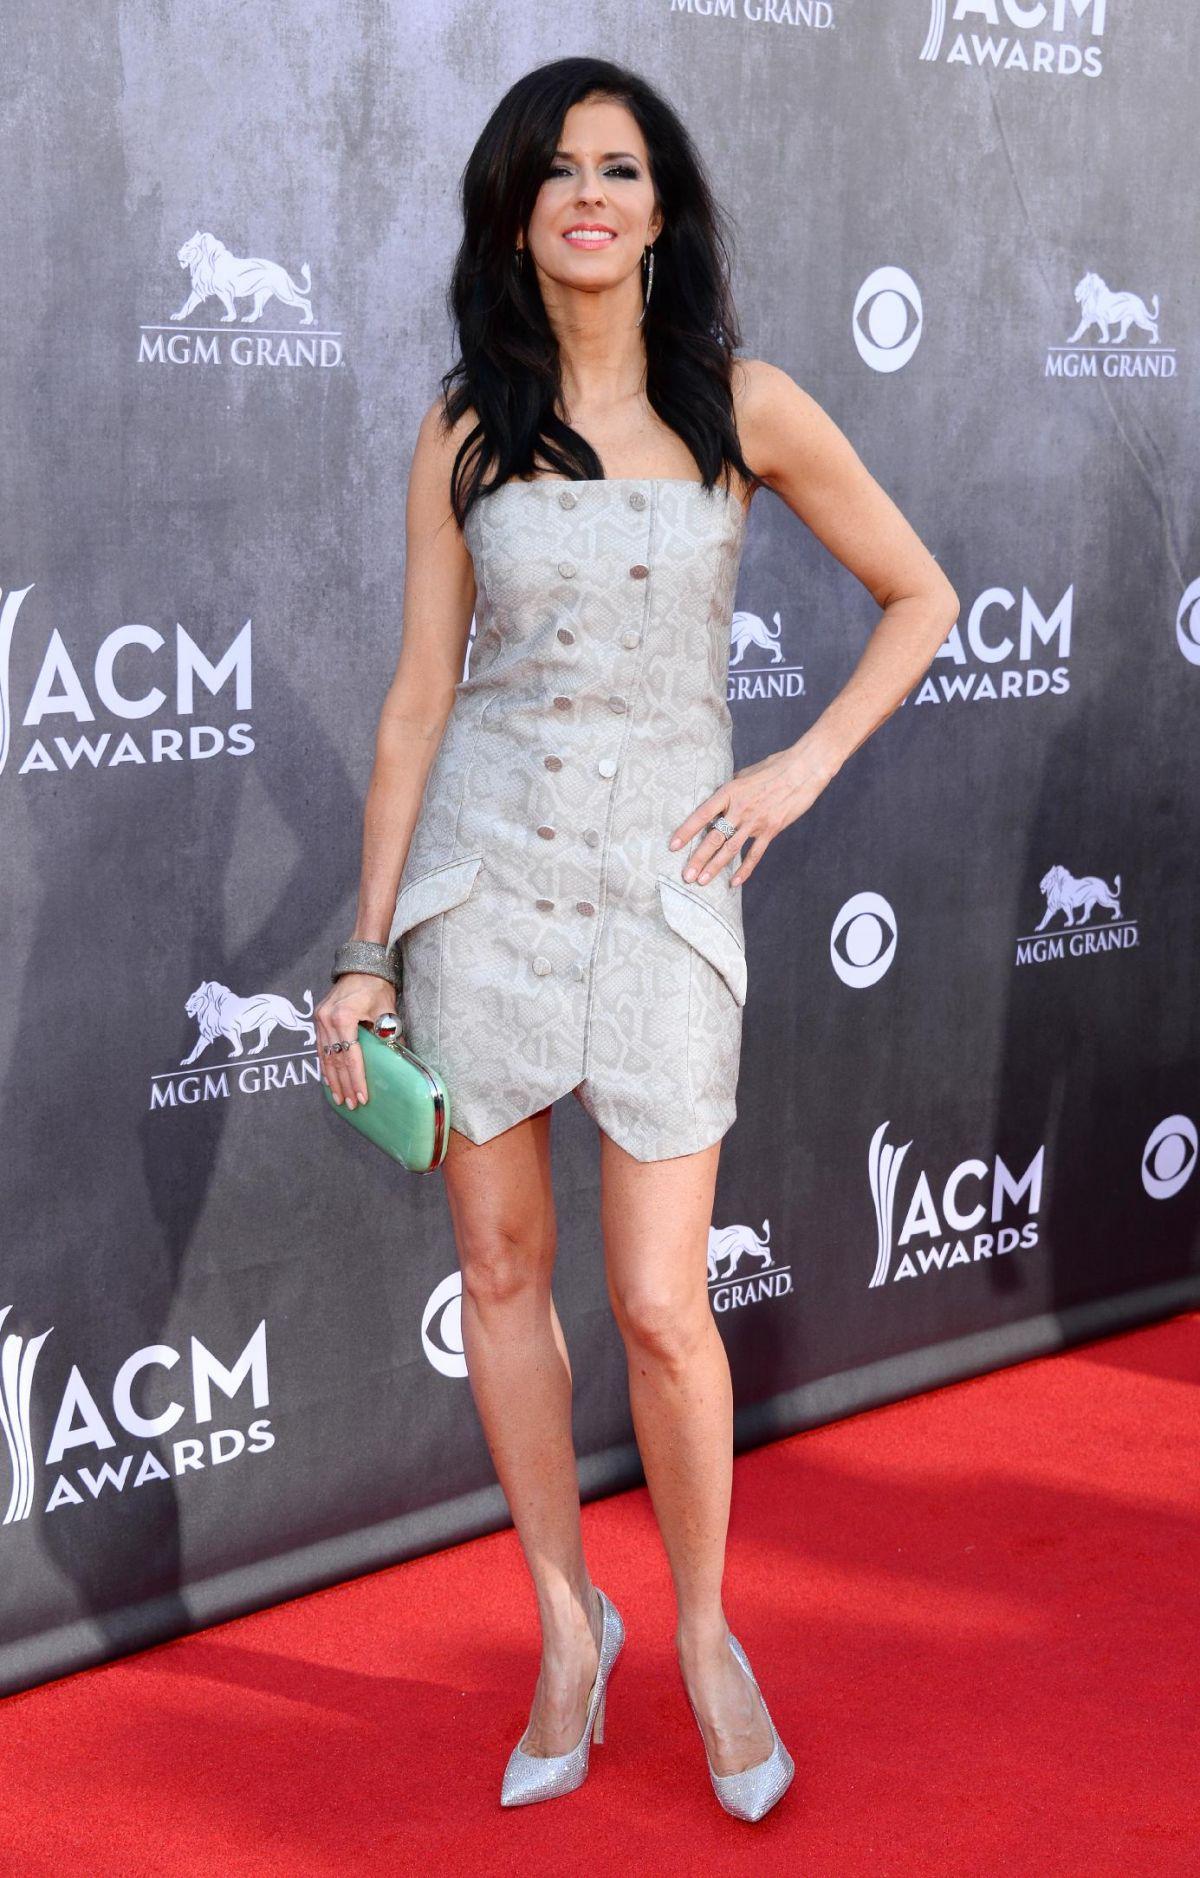 KAREN FAIRCHILD at 2014 Academy of Country Music Awards